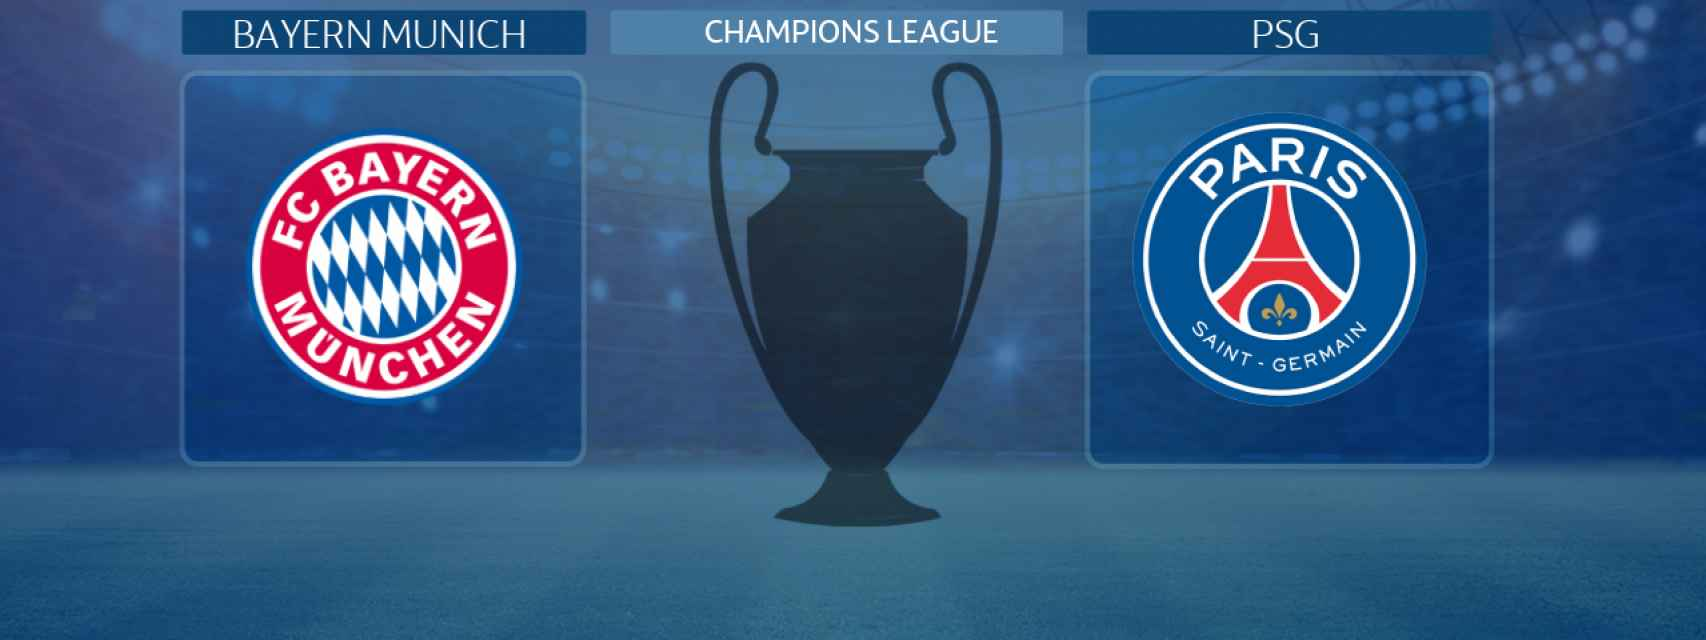 Bayern Munich - PSG, partido de la Champions League